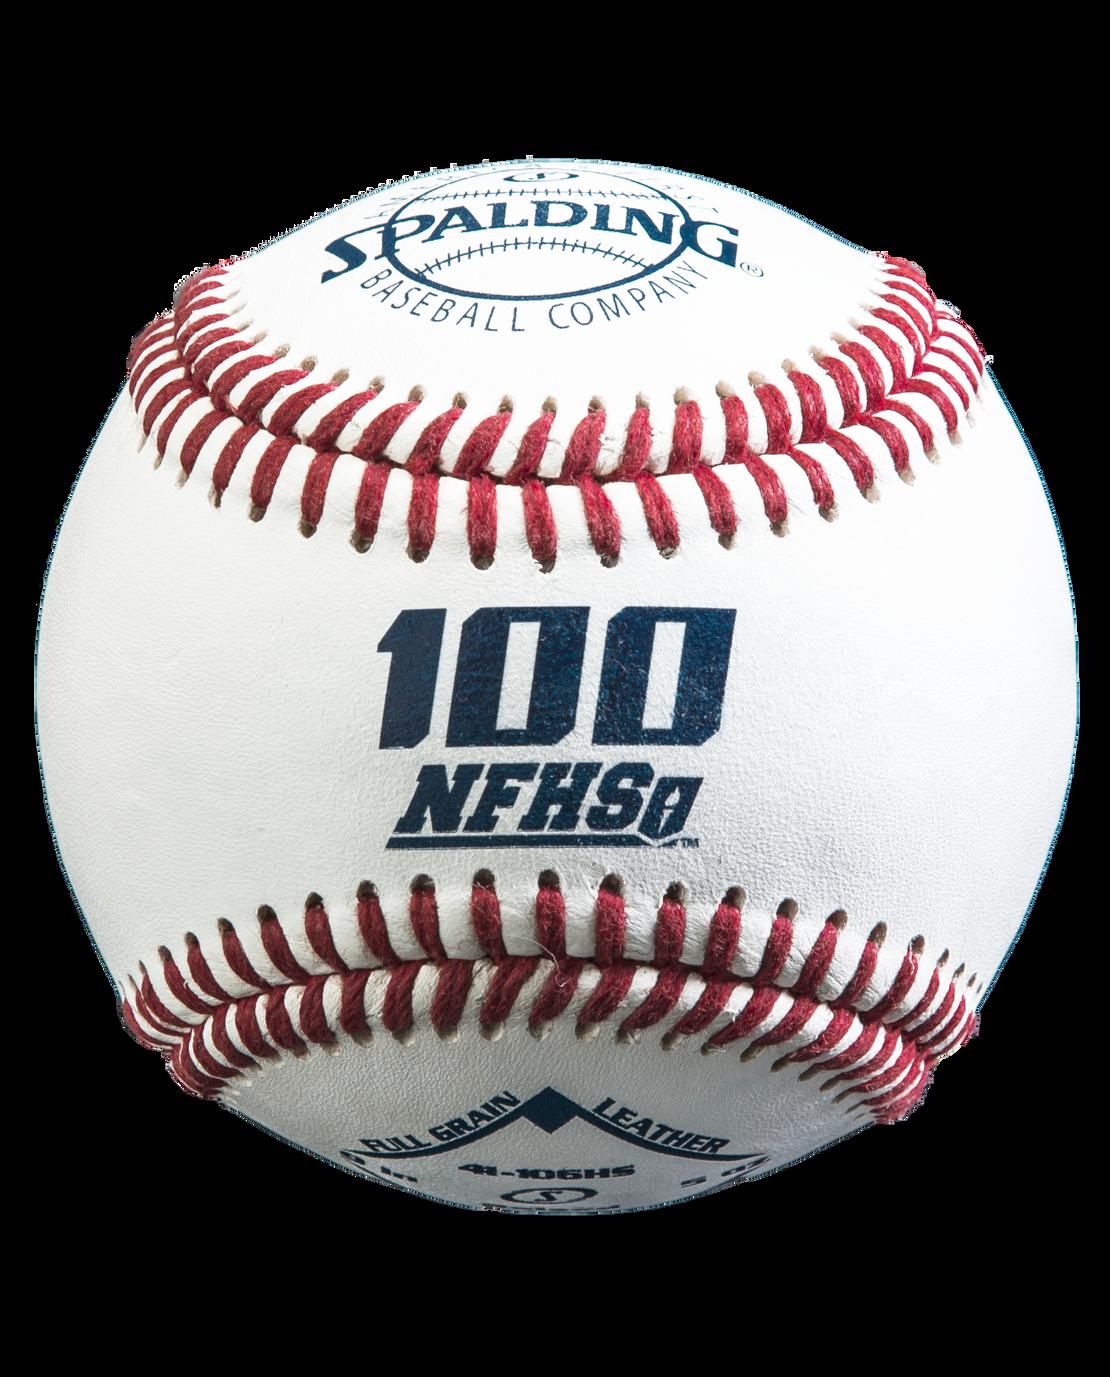 RAISED SEAM 100 NFHS BASEBALL - 12 PACK